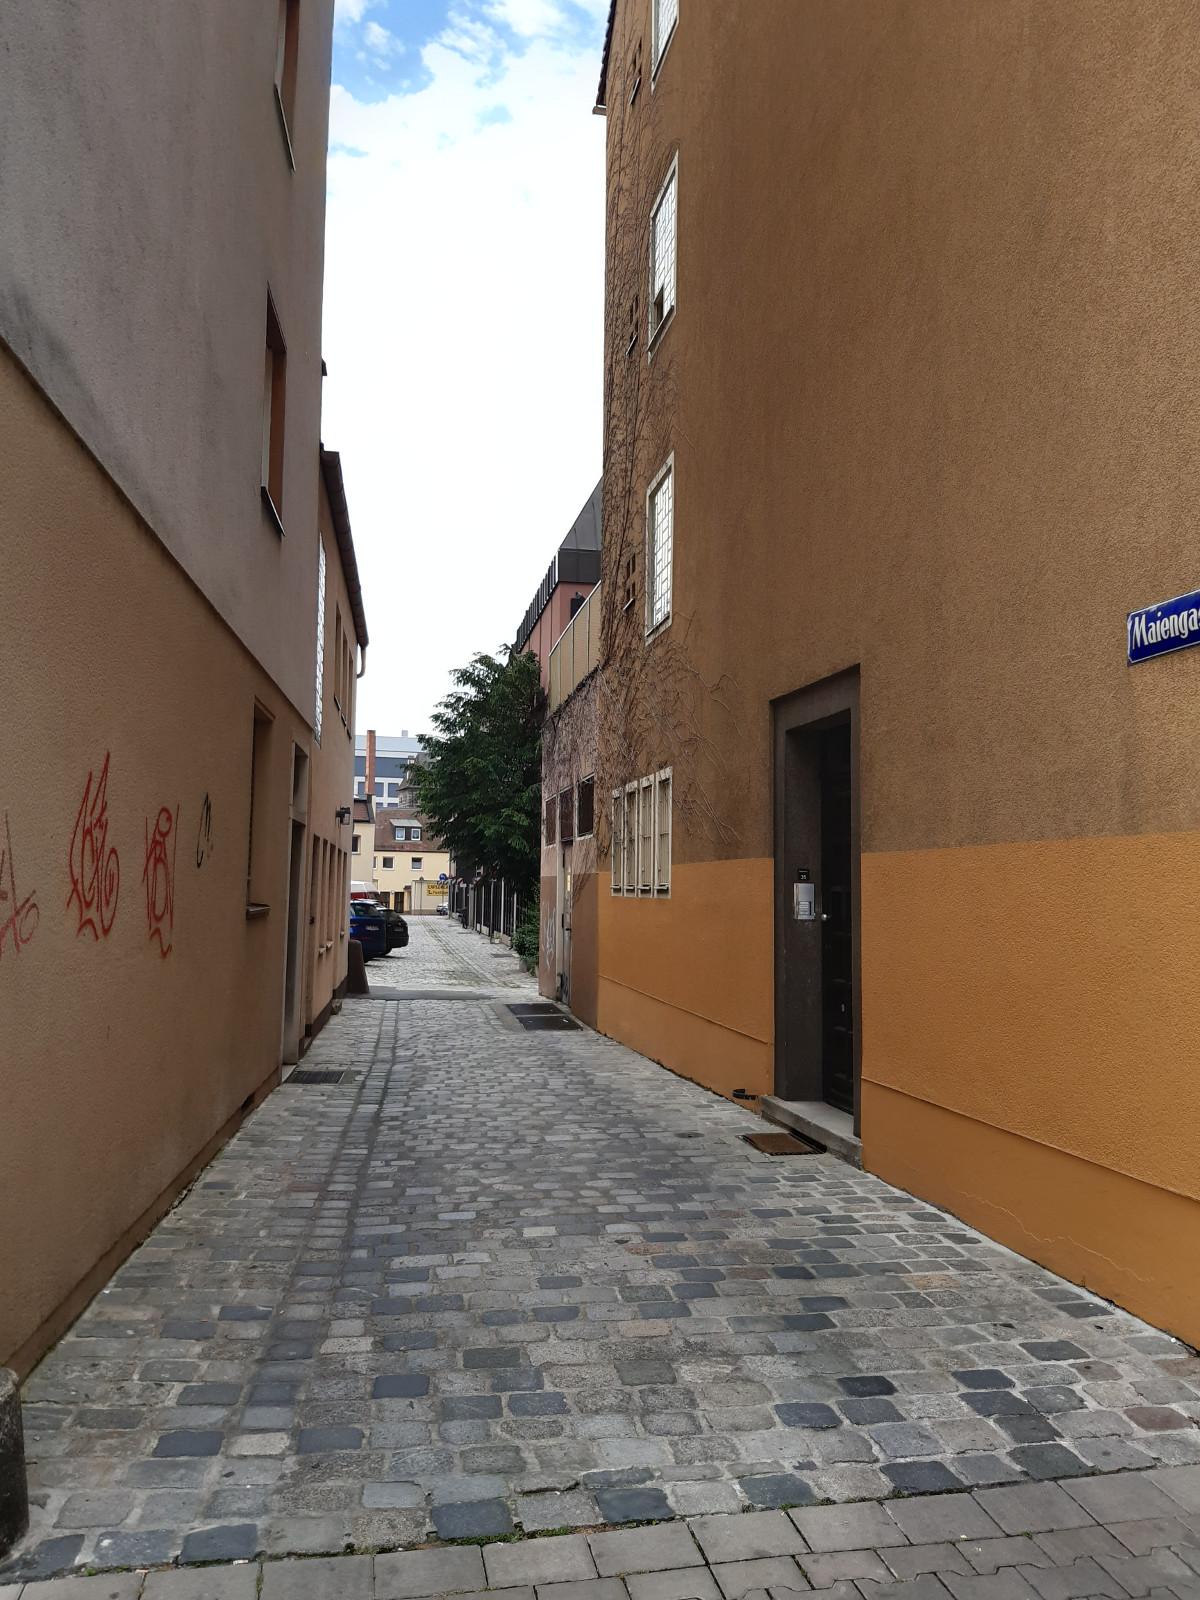 2021-09-07-03-50-16-8Maiengasse.jpg - Atelier Haberbosch Nürnberg